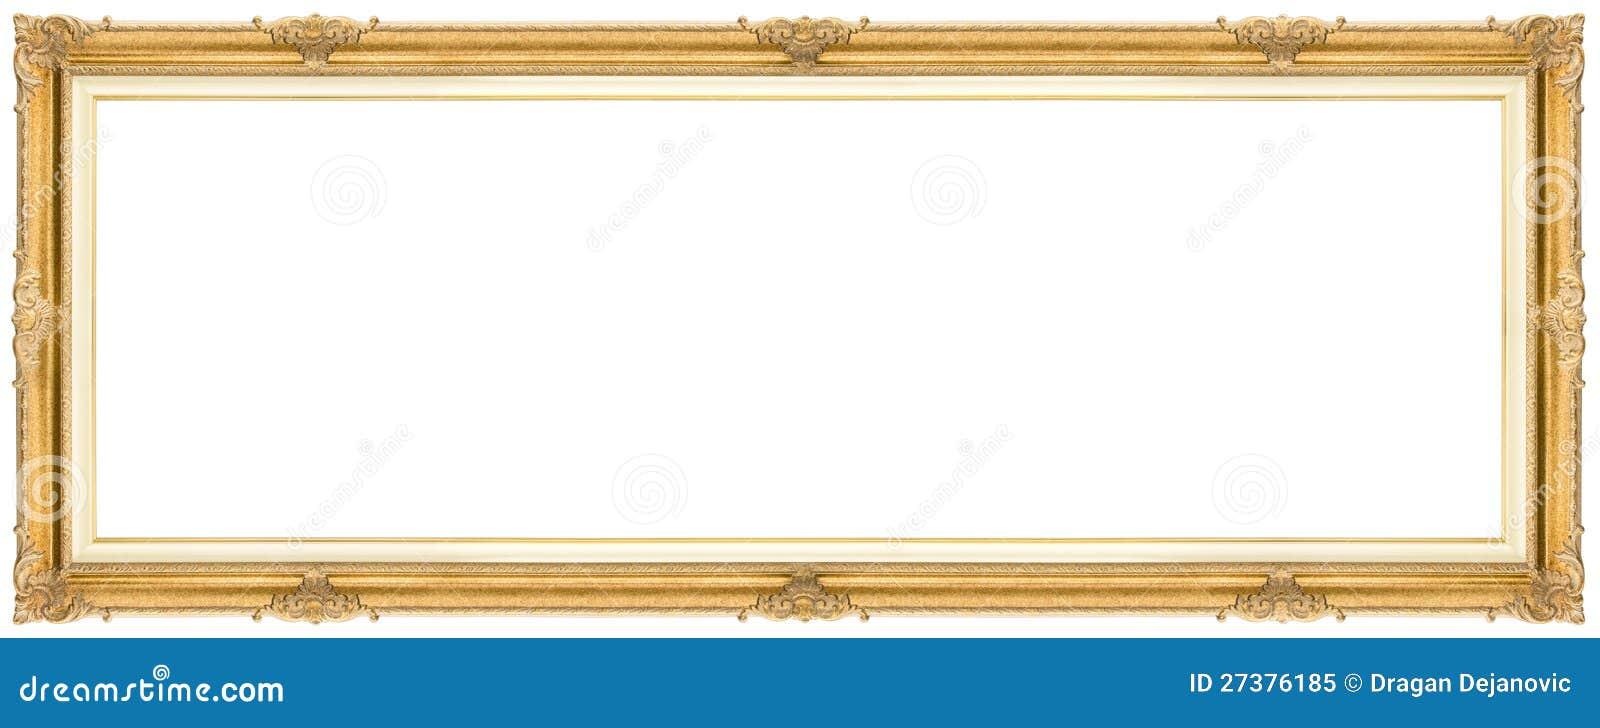 Wide Golden Frame stock image. Image of antique, gallery - 27376185